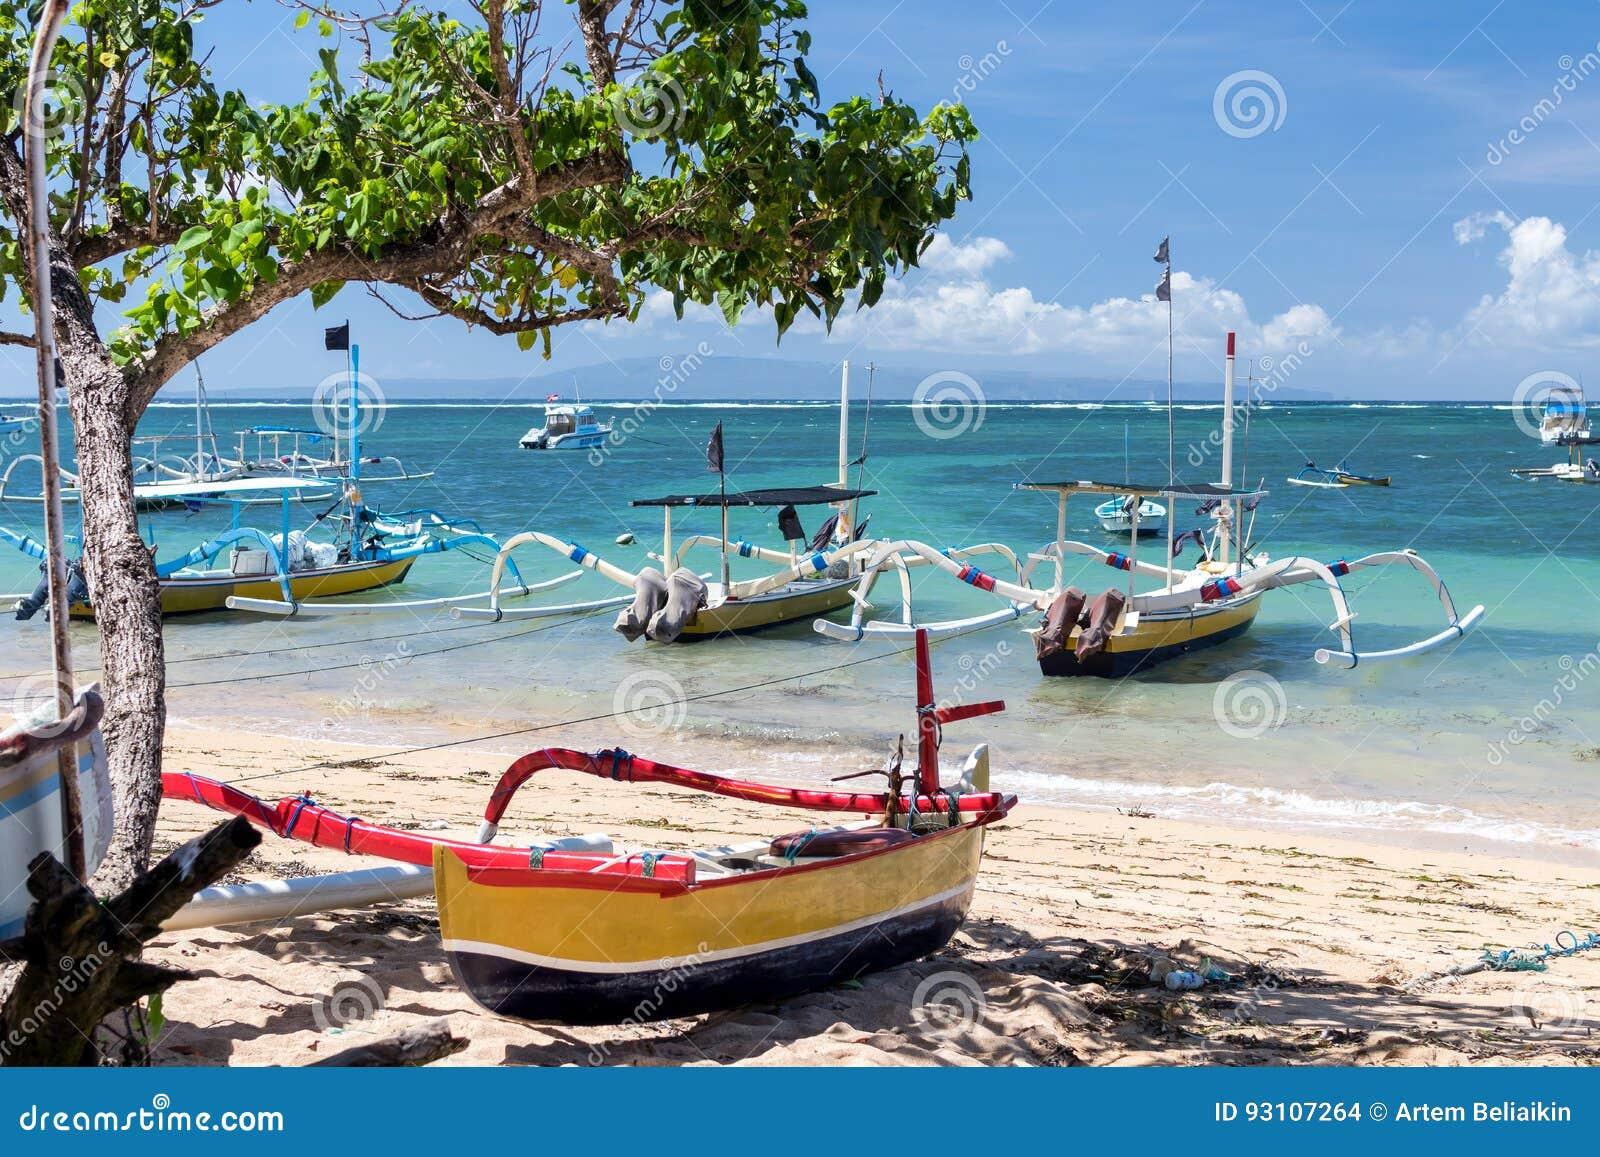 Fishing Boats In The Indian Ocean Tropical Island Bali Indonesia Sanur Beach